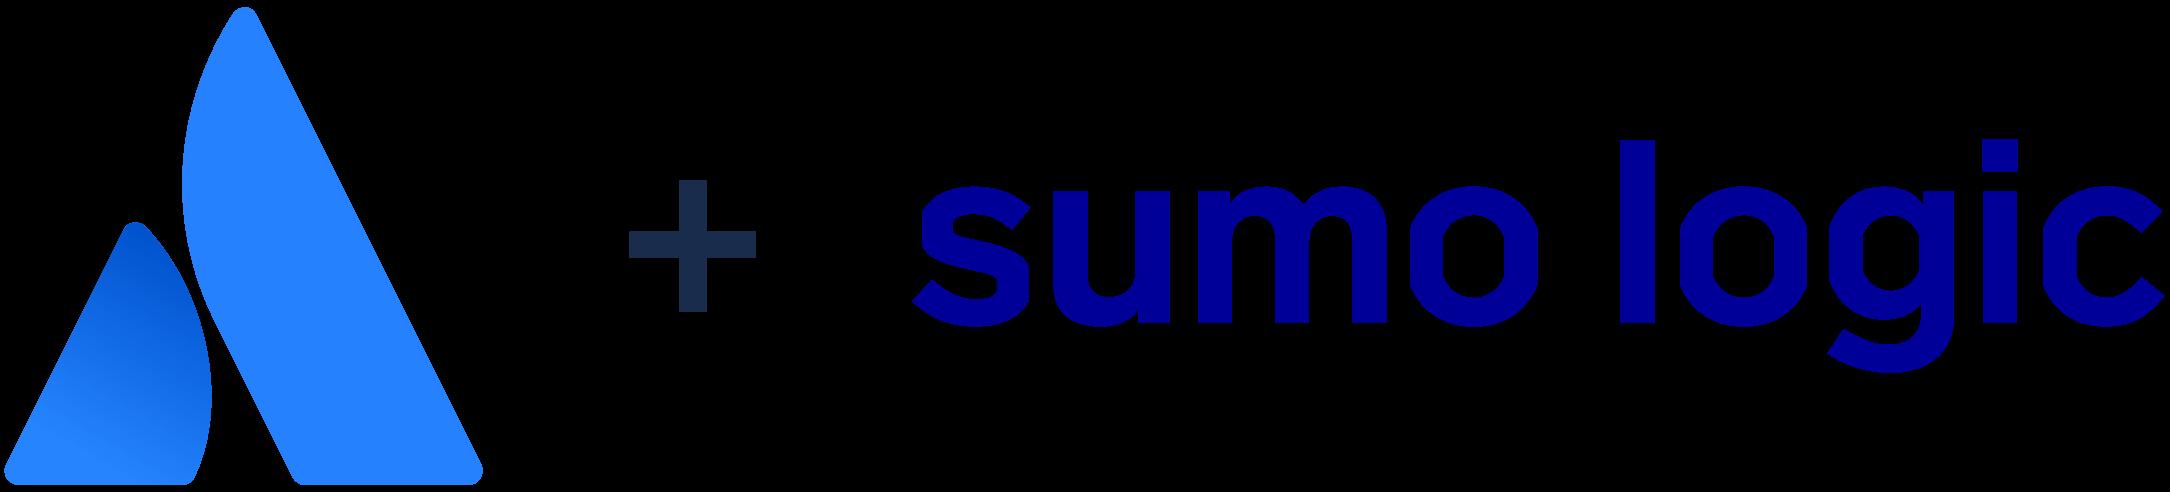 Logo Atlassian + logo Sumo Logic